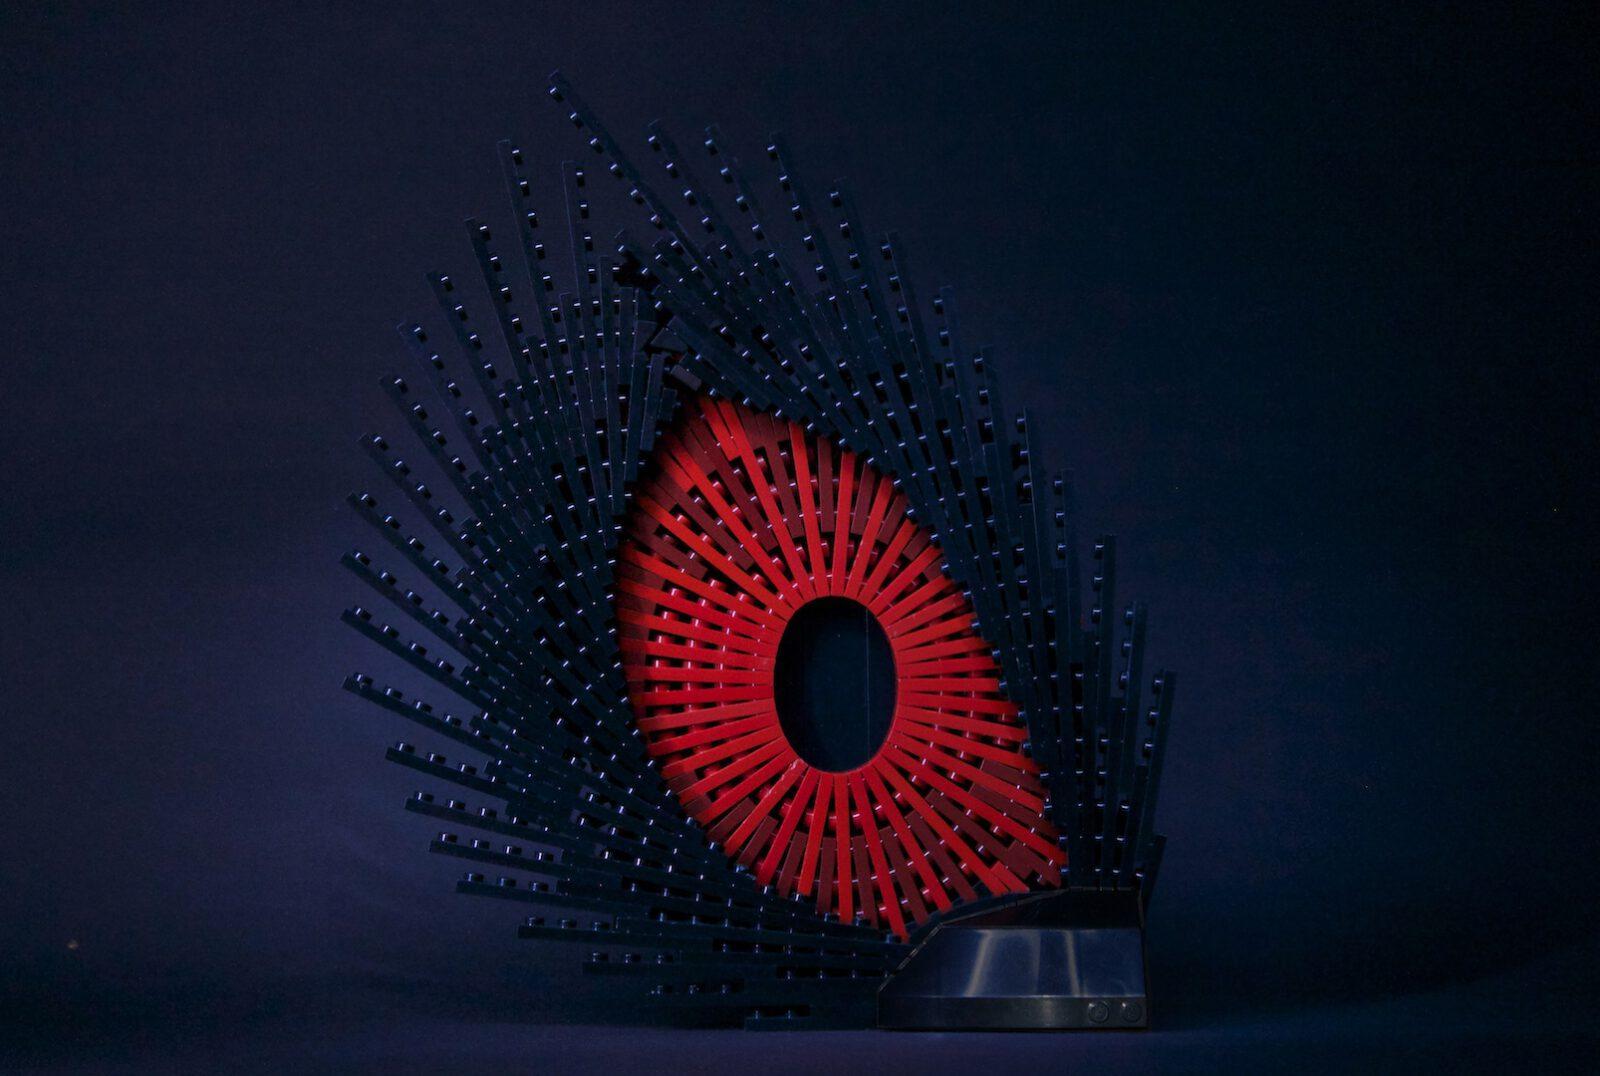 Skulptur eines roten Legoauges